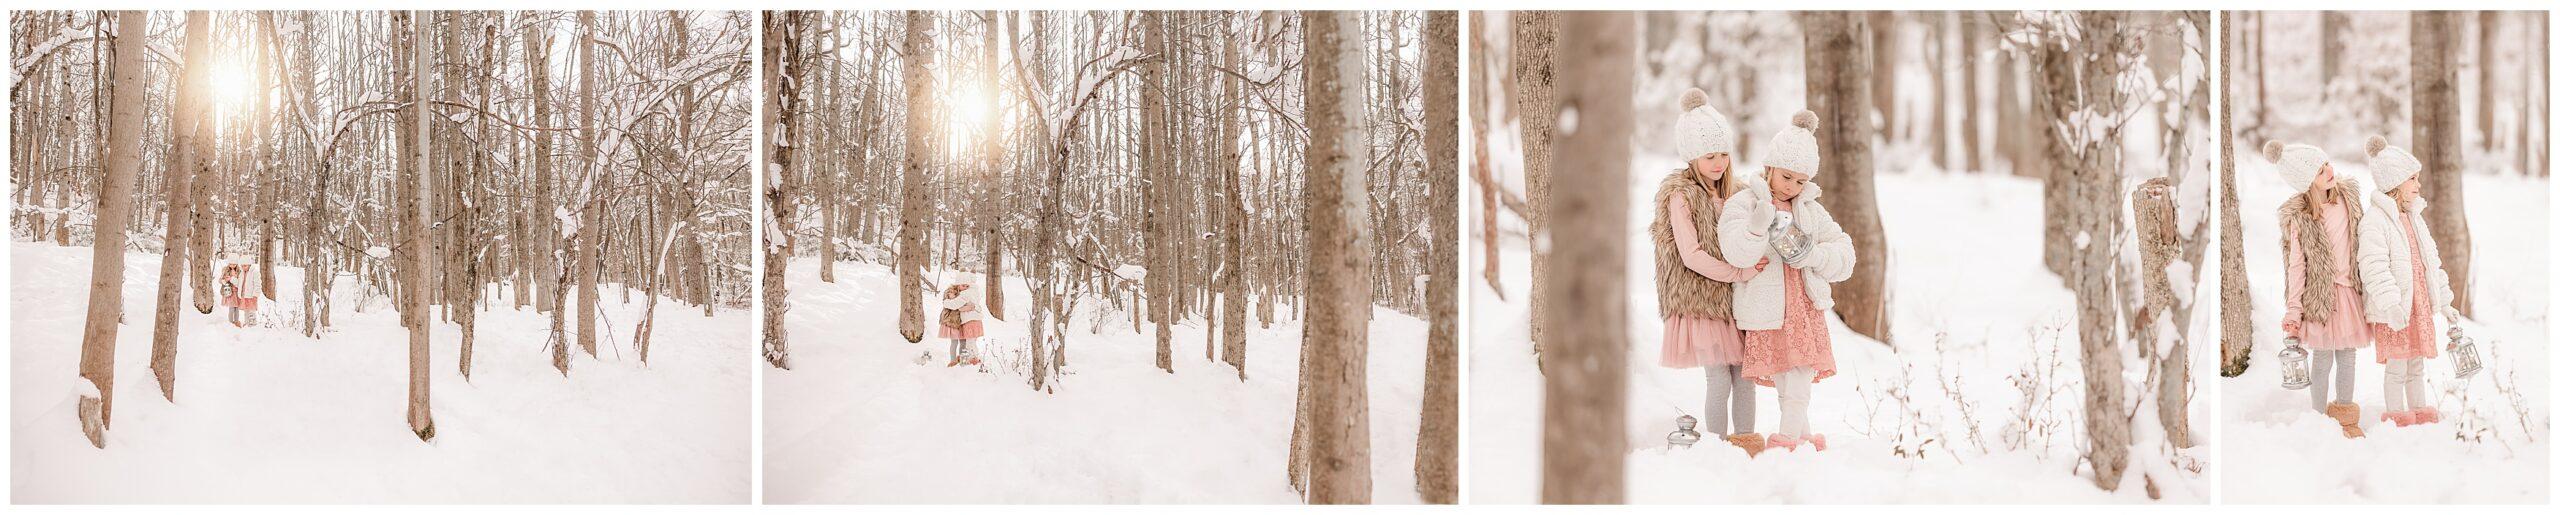 Pamela Salai Photography snow mini session.1 jpg